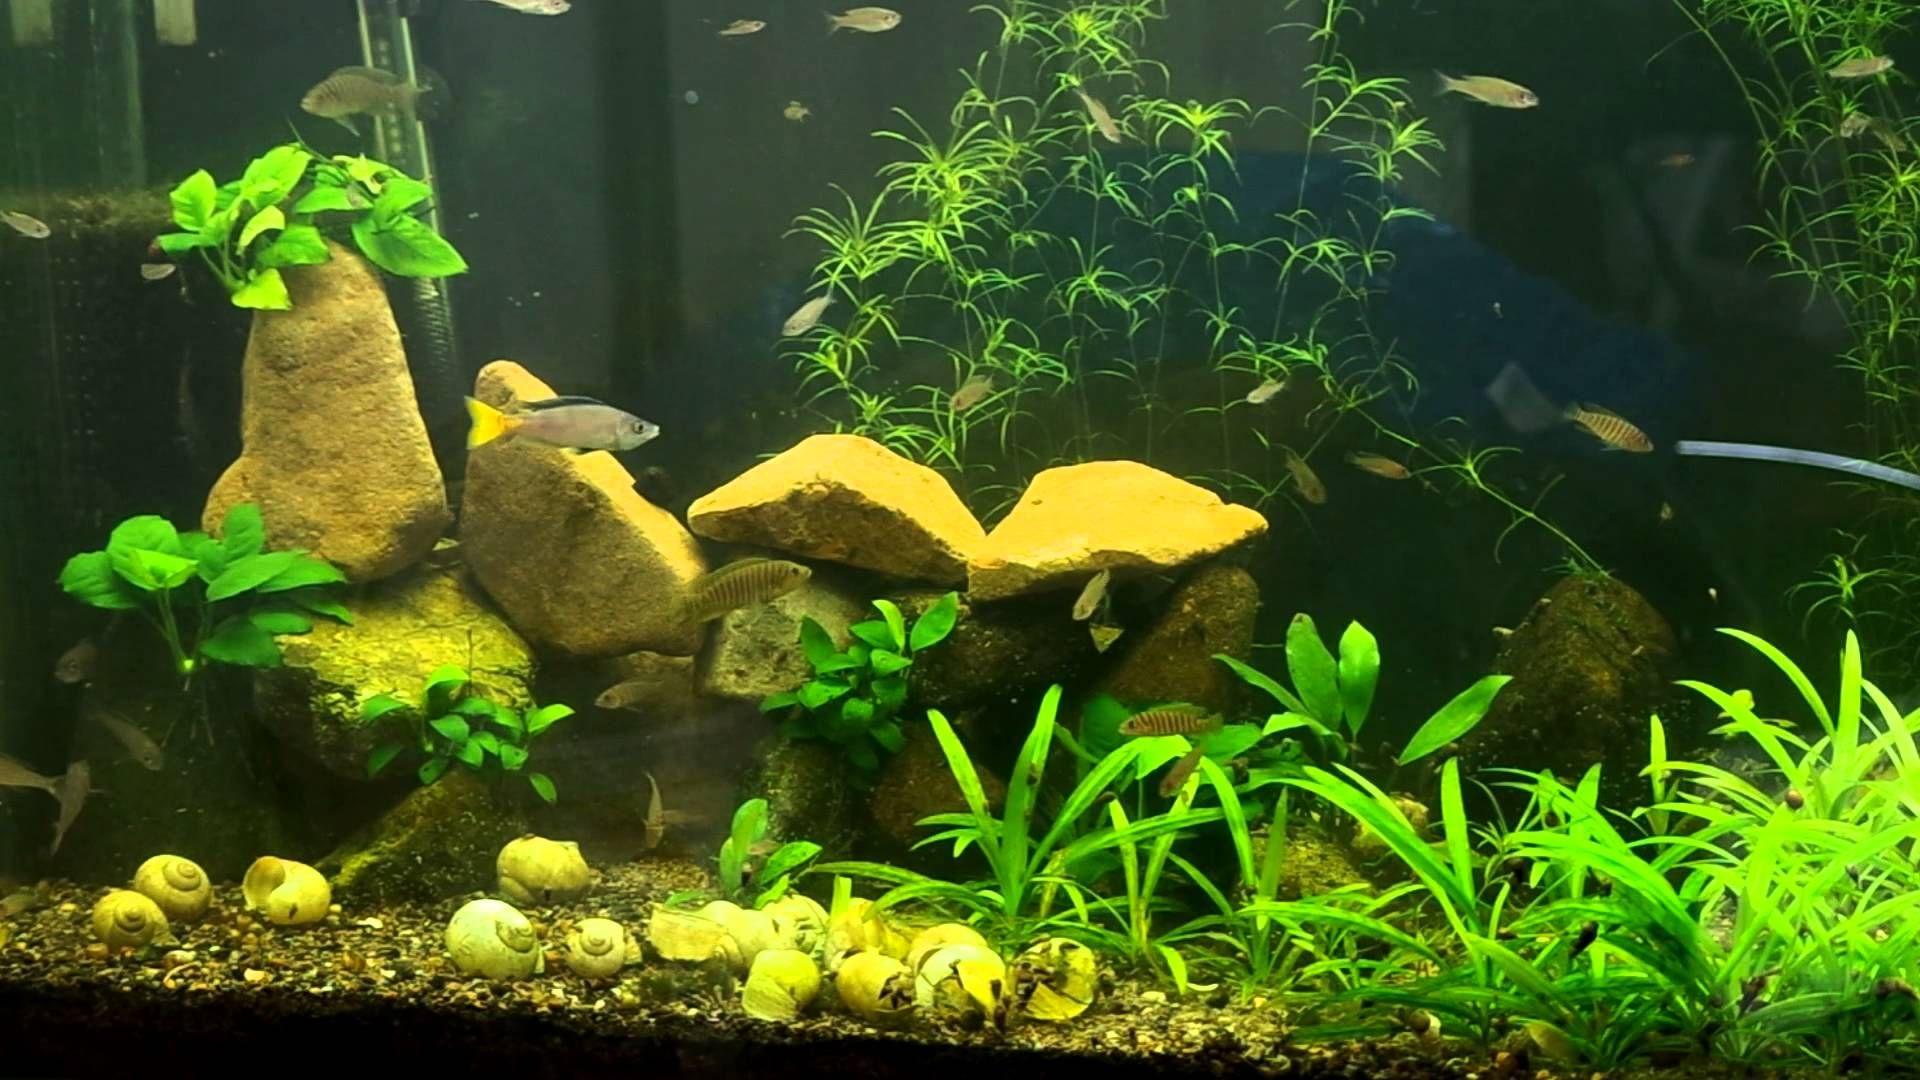 Tanganyika in liters aquarium reef tank stuff for datty